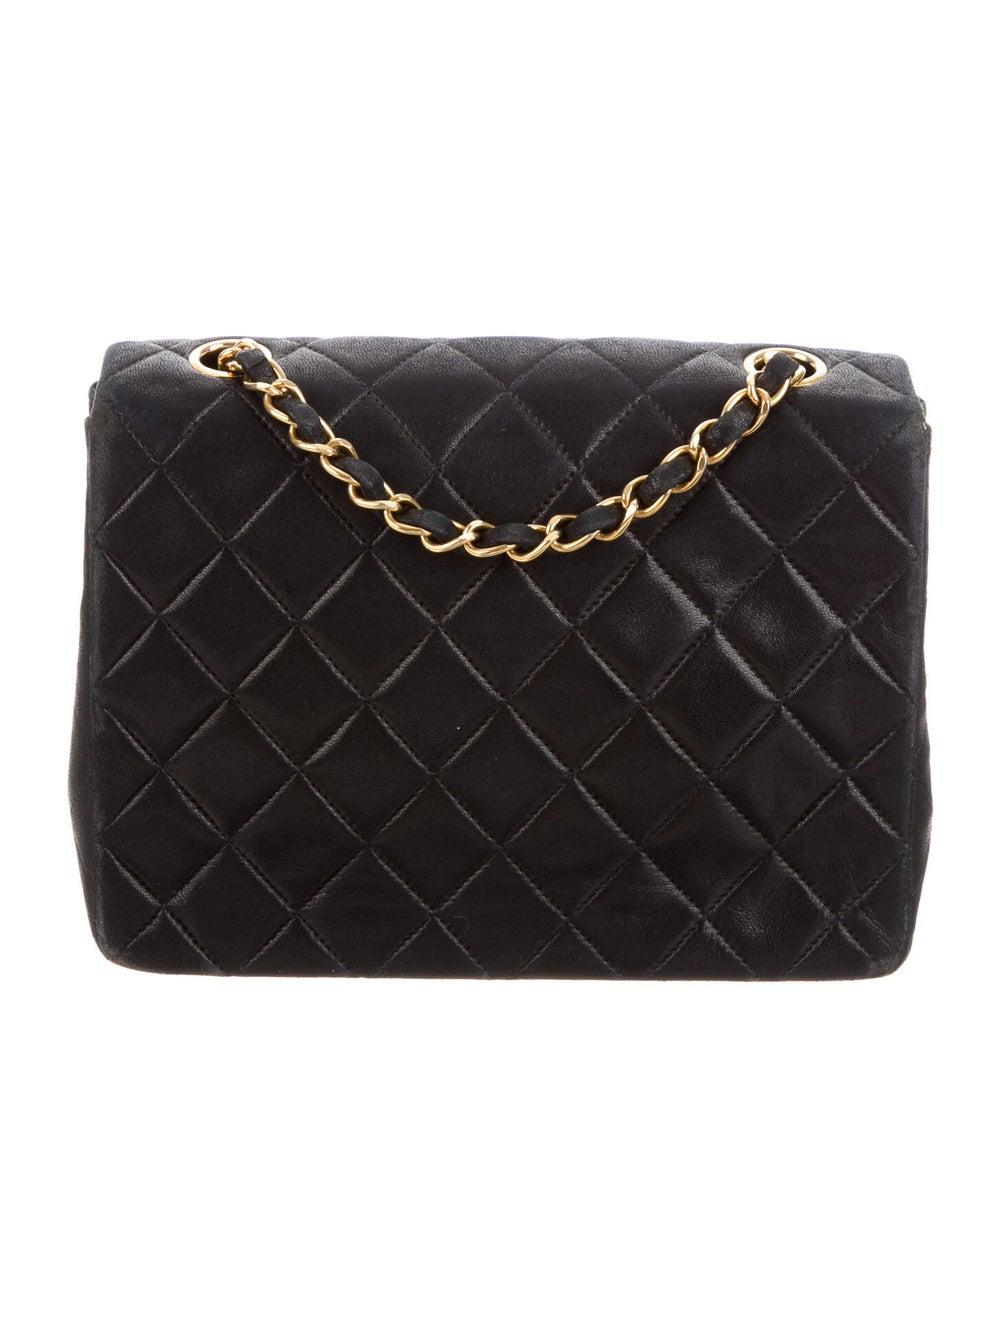 Chanel Vintage Classic Small Single Flap Bag Blue - image 4